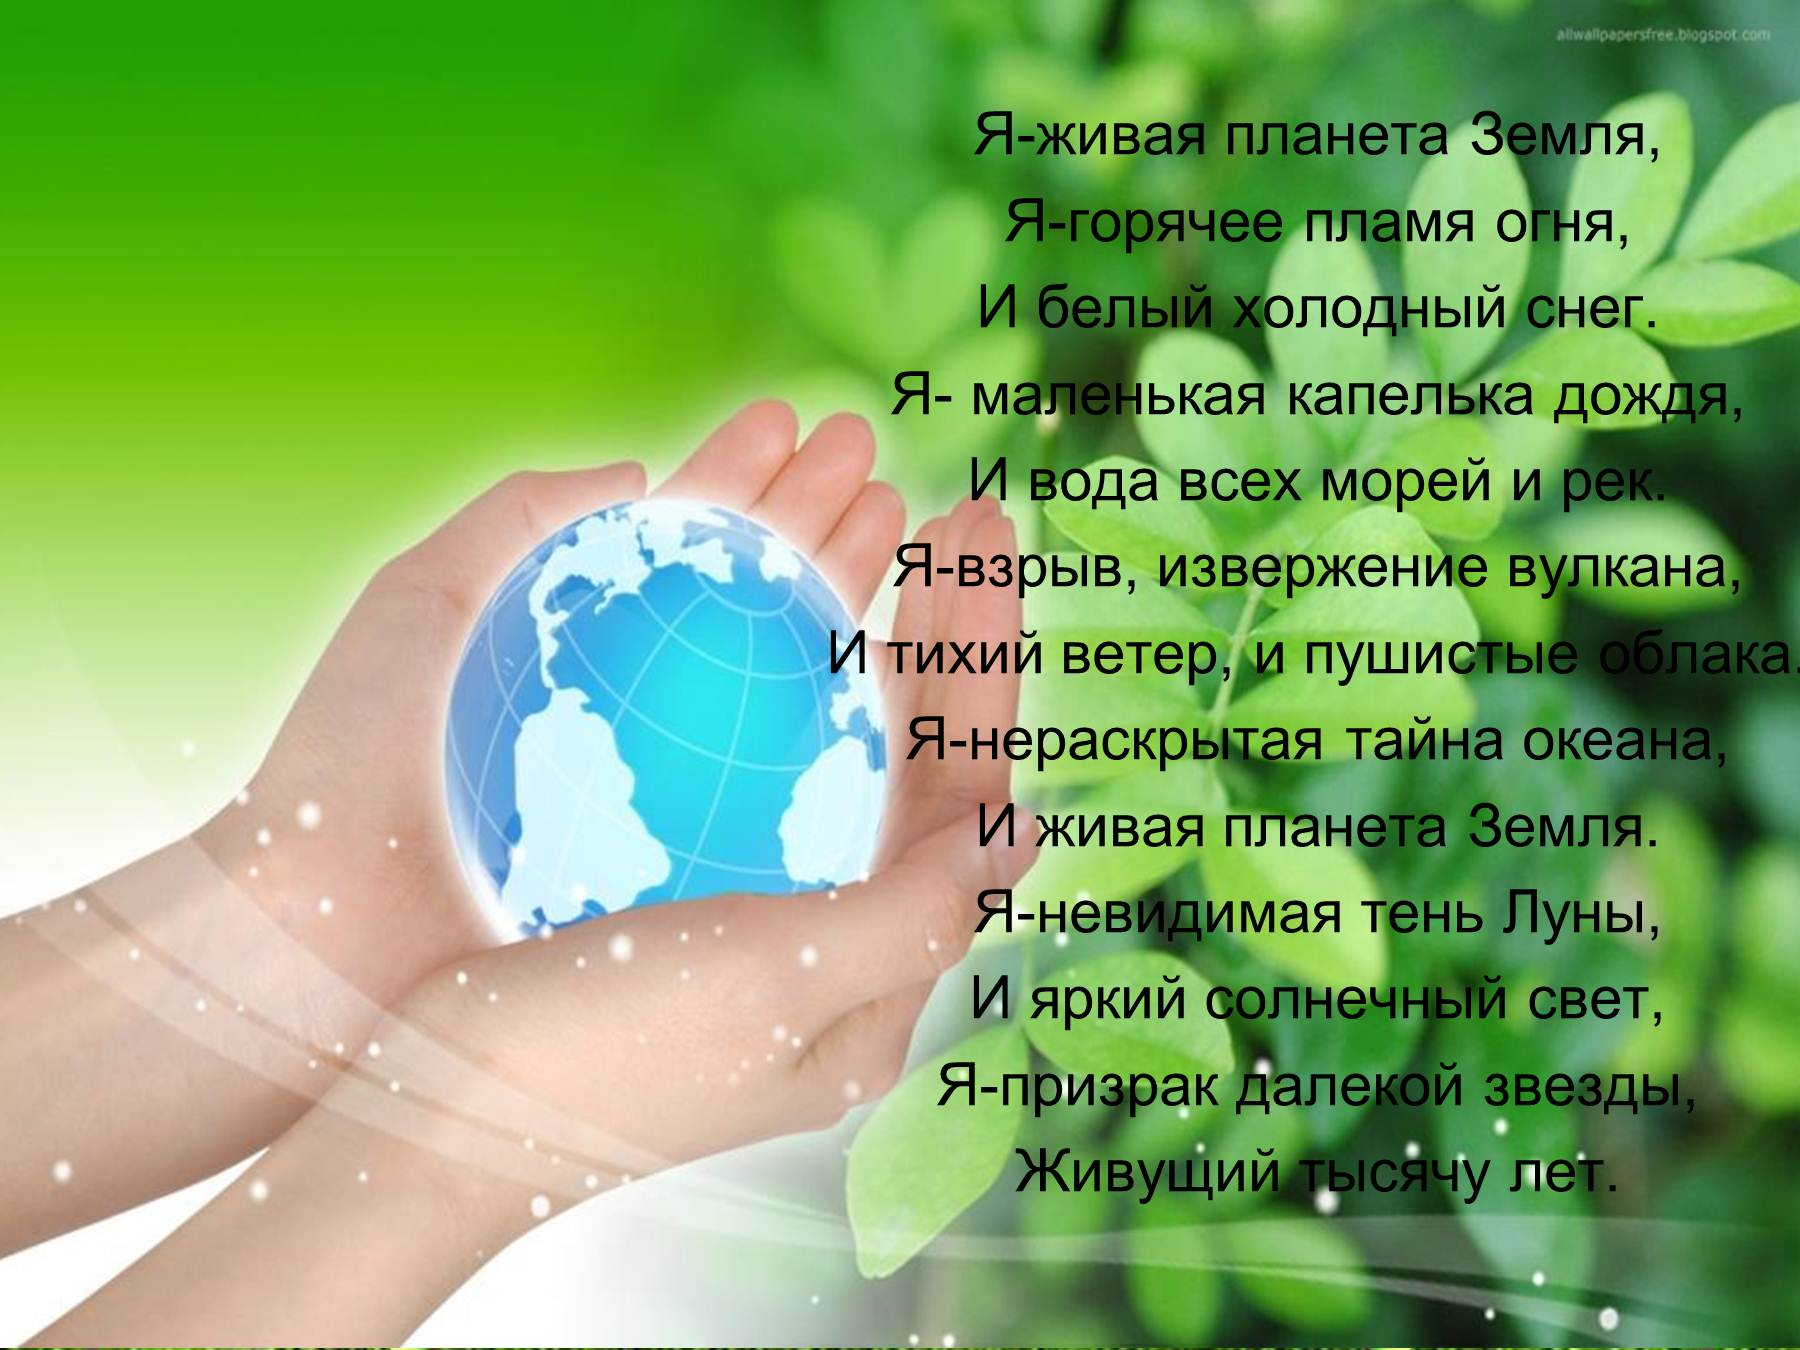 Картинки по экологии с цитатами